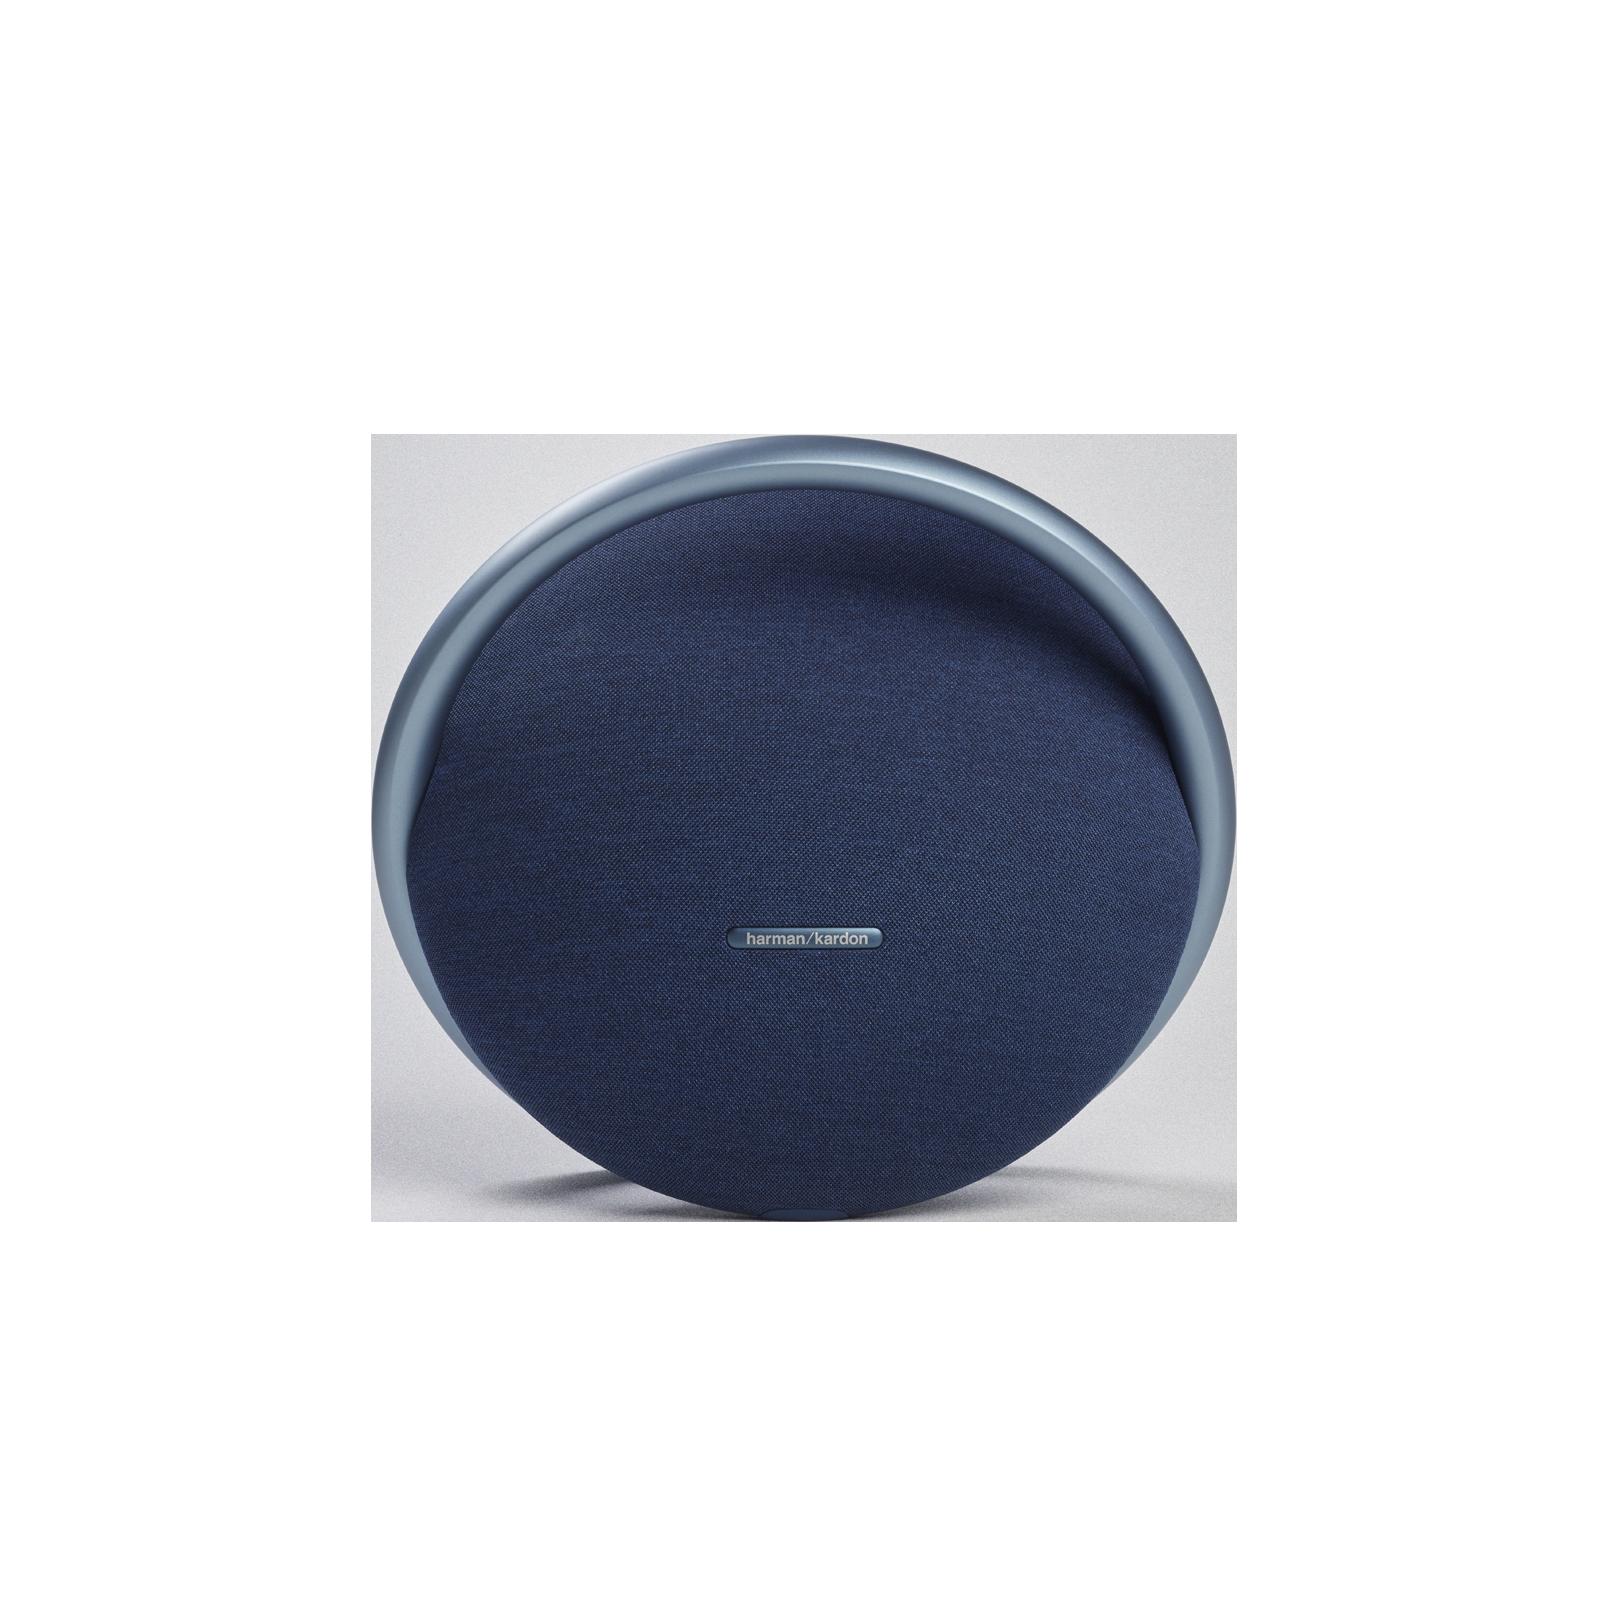 Onyx Studio 7 - Blue - Portable Stereo Bluetooth Speaker - Front